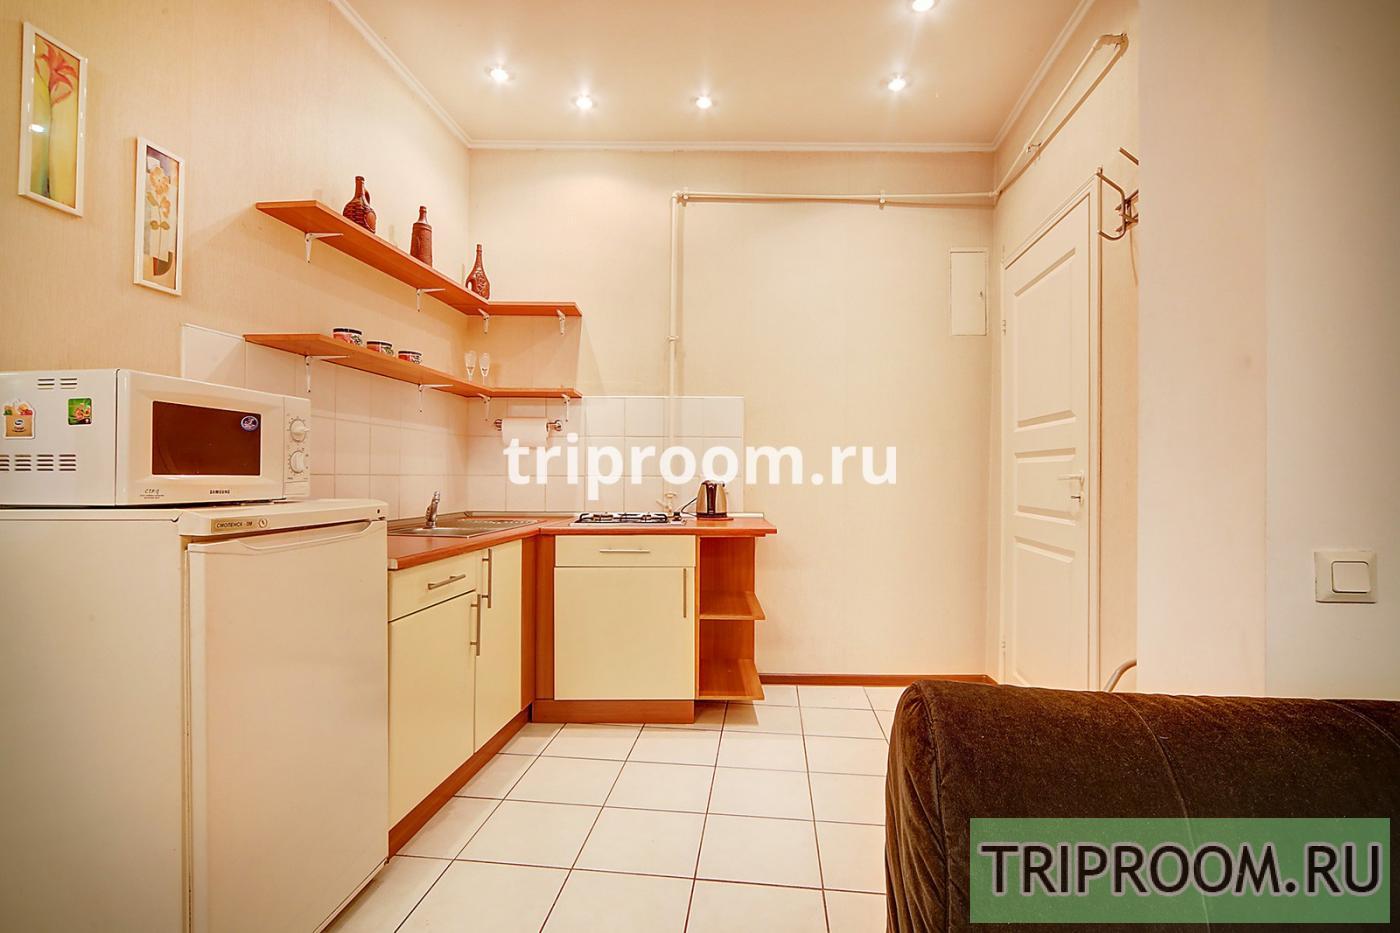 1-комнатная квартира посуточно (вариант № 15082), ул. Невский проспект, фото № 7